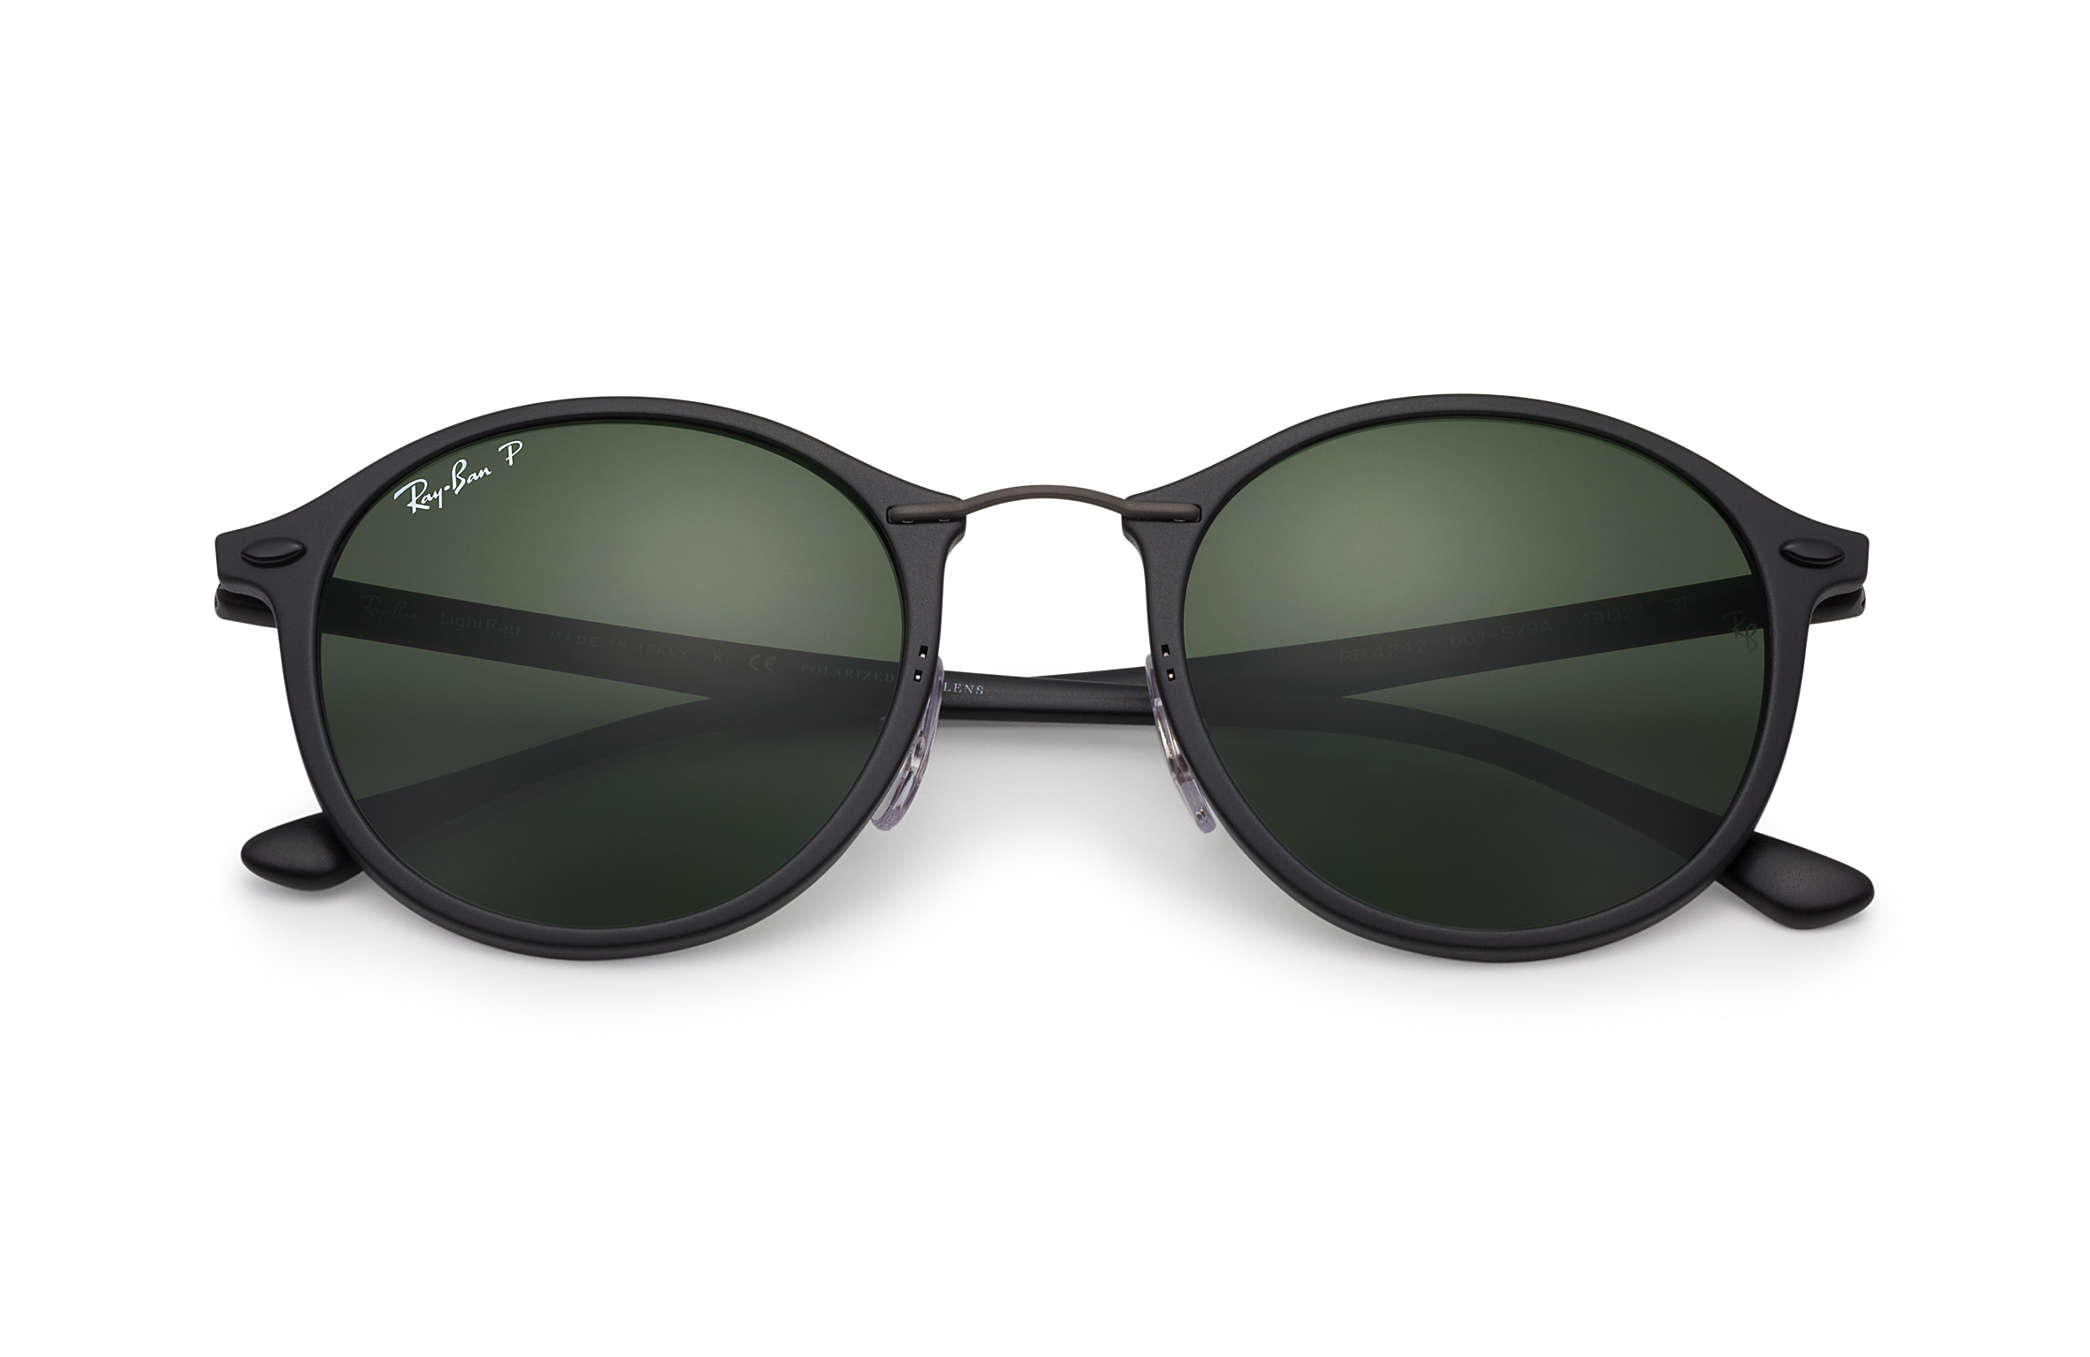 18661d0c19 Ray-Ban RB4242 Black - LightRay Titanium - Green Polarized Lenses ...